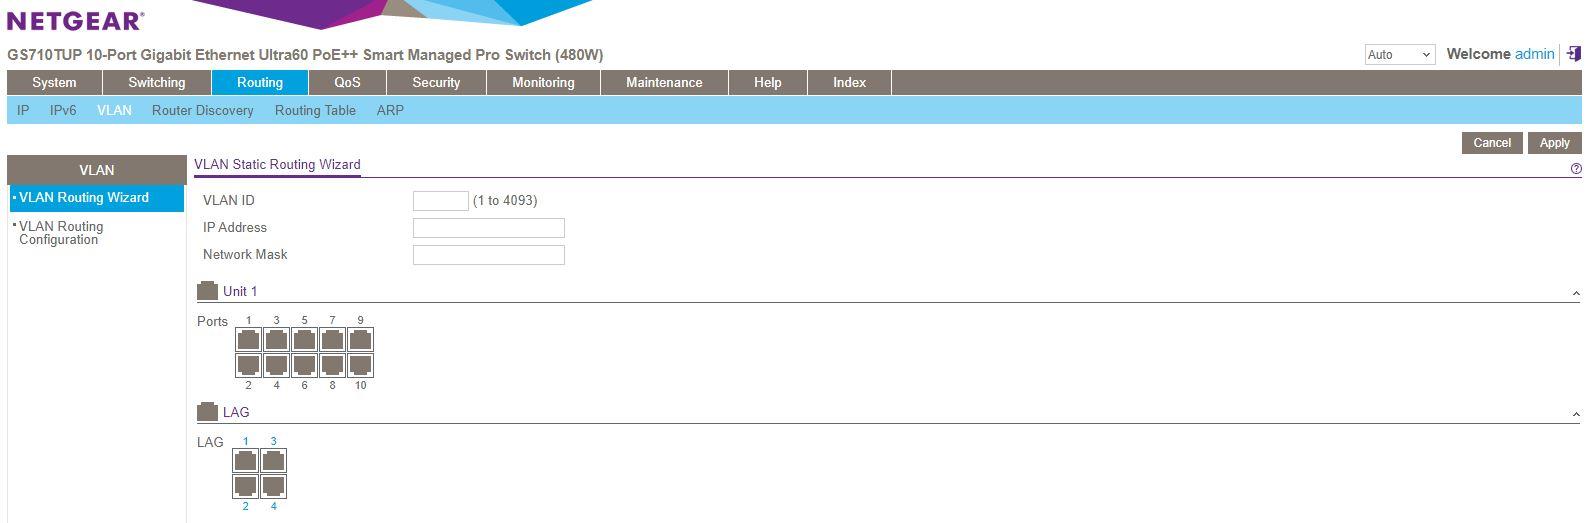 Netgear GS710TUP Insight Management Registered Routing VLAN Configuration